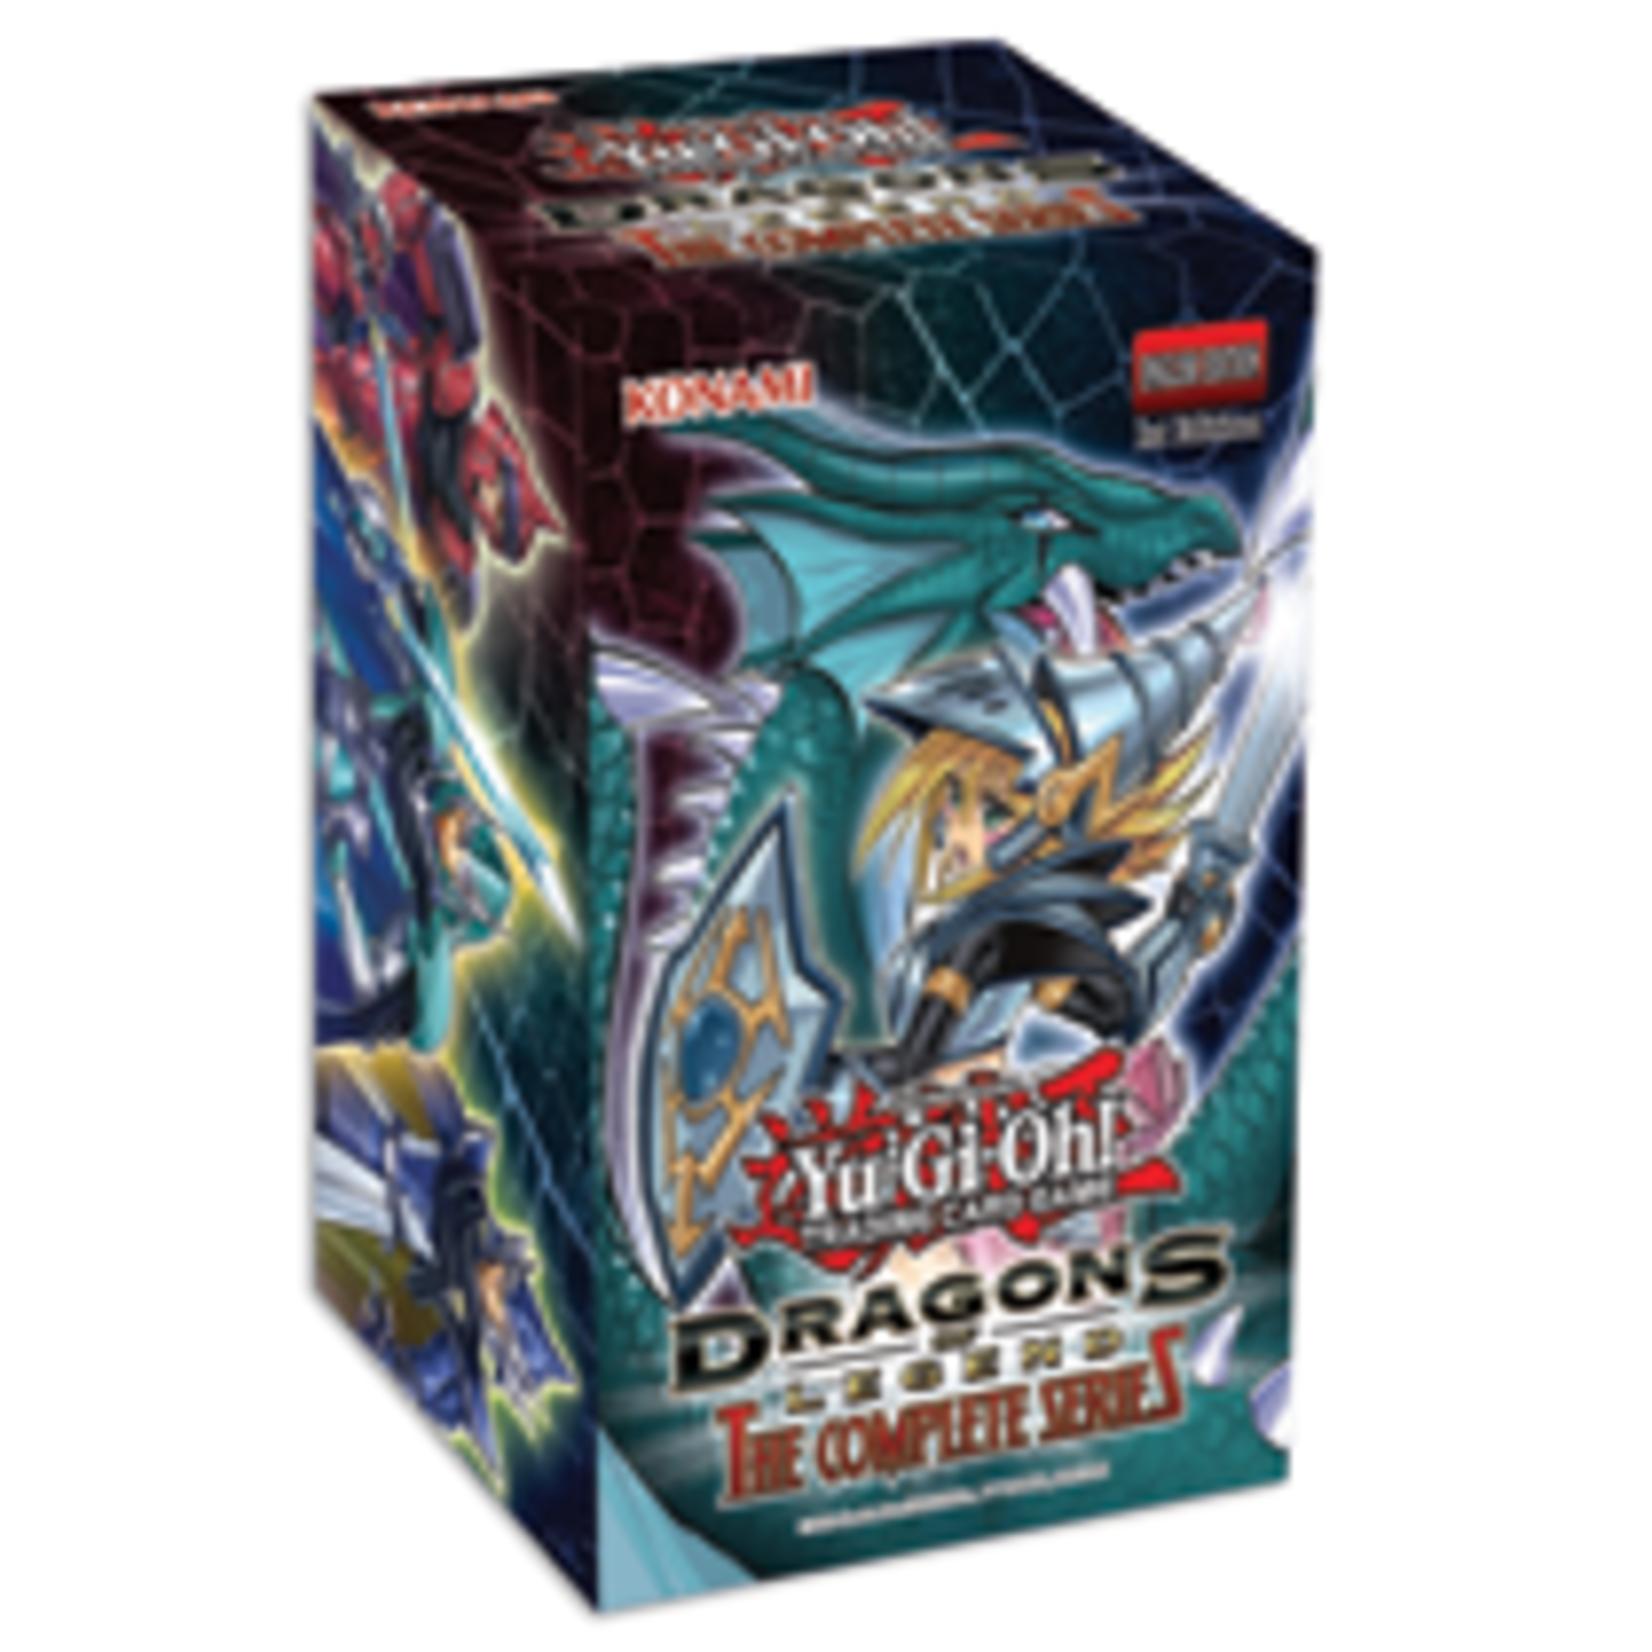 Konami Dragons of Legend: The Complete Series